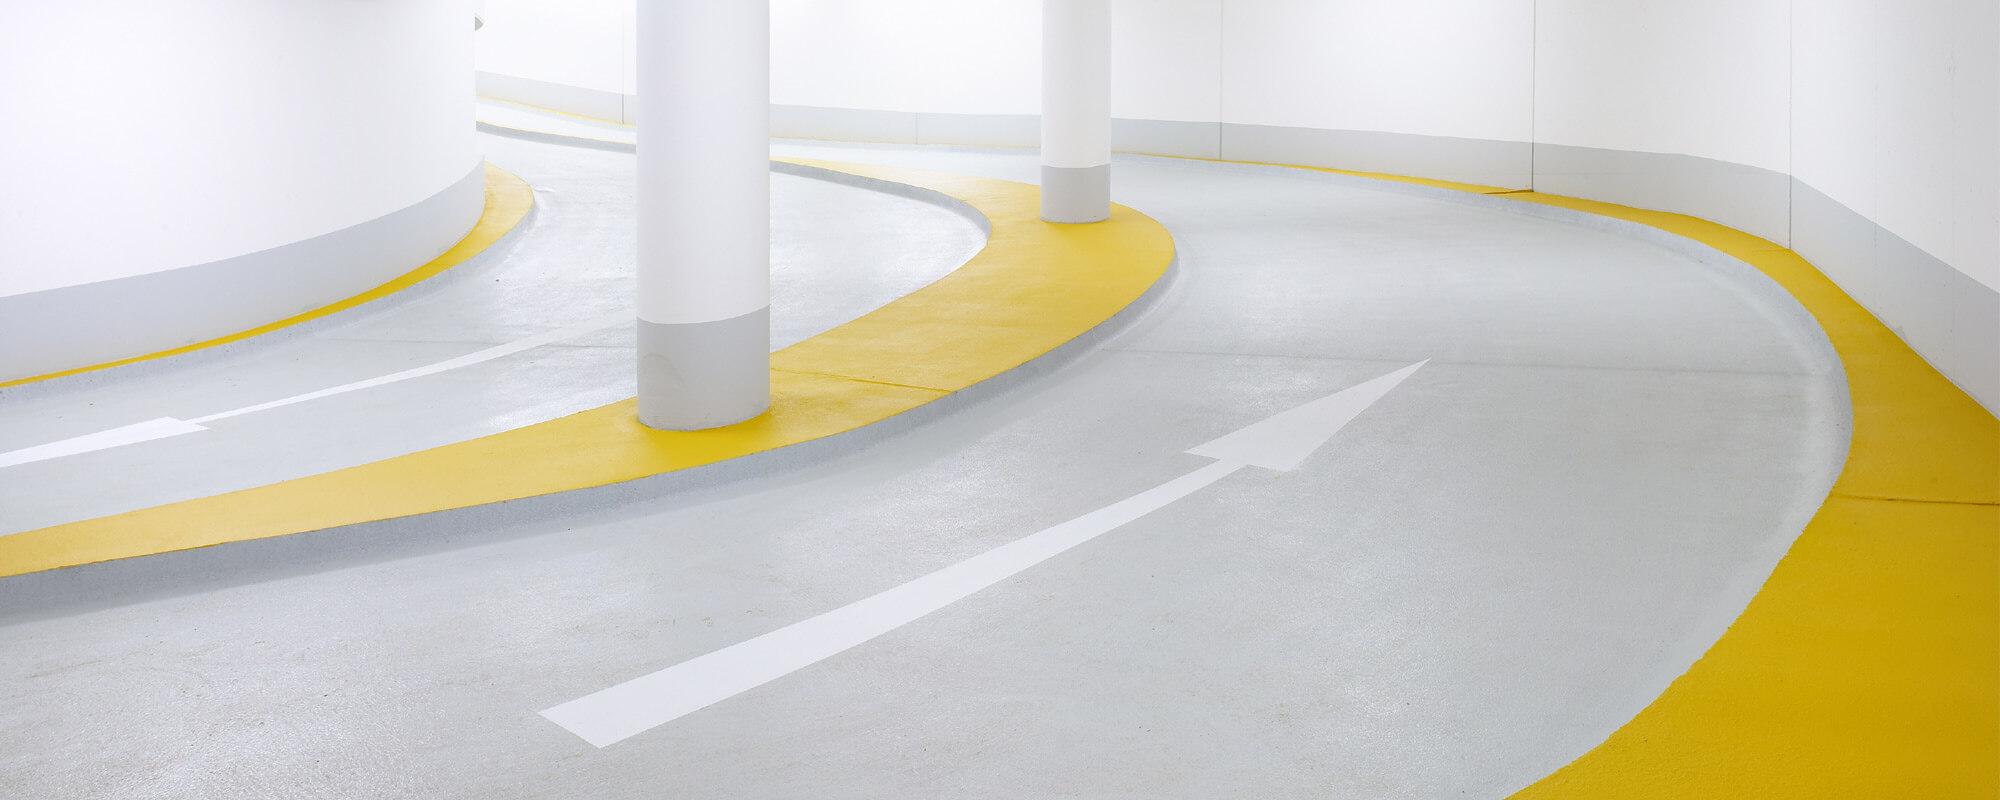 baulicher brandschutz f r stahl holz beton kabel schott fugen. Black Bedroom Furniture Sets. Home Design Ideas